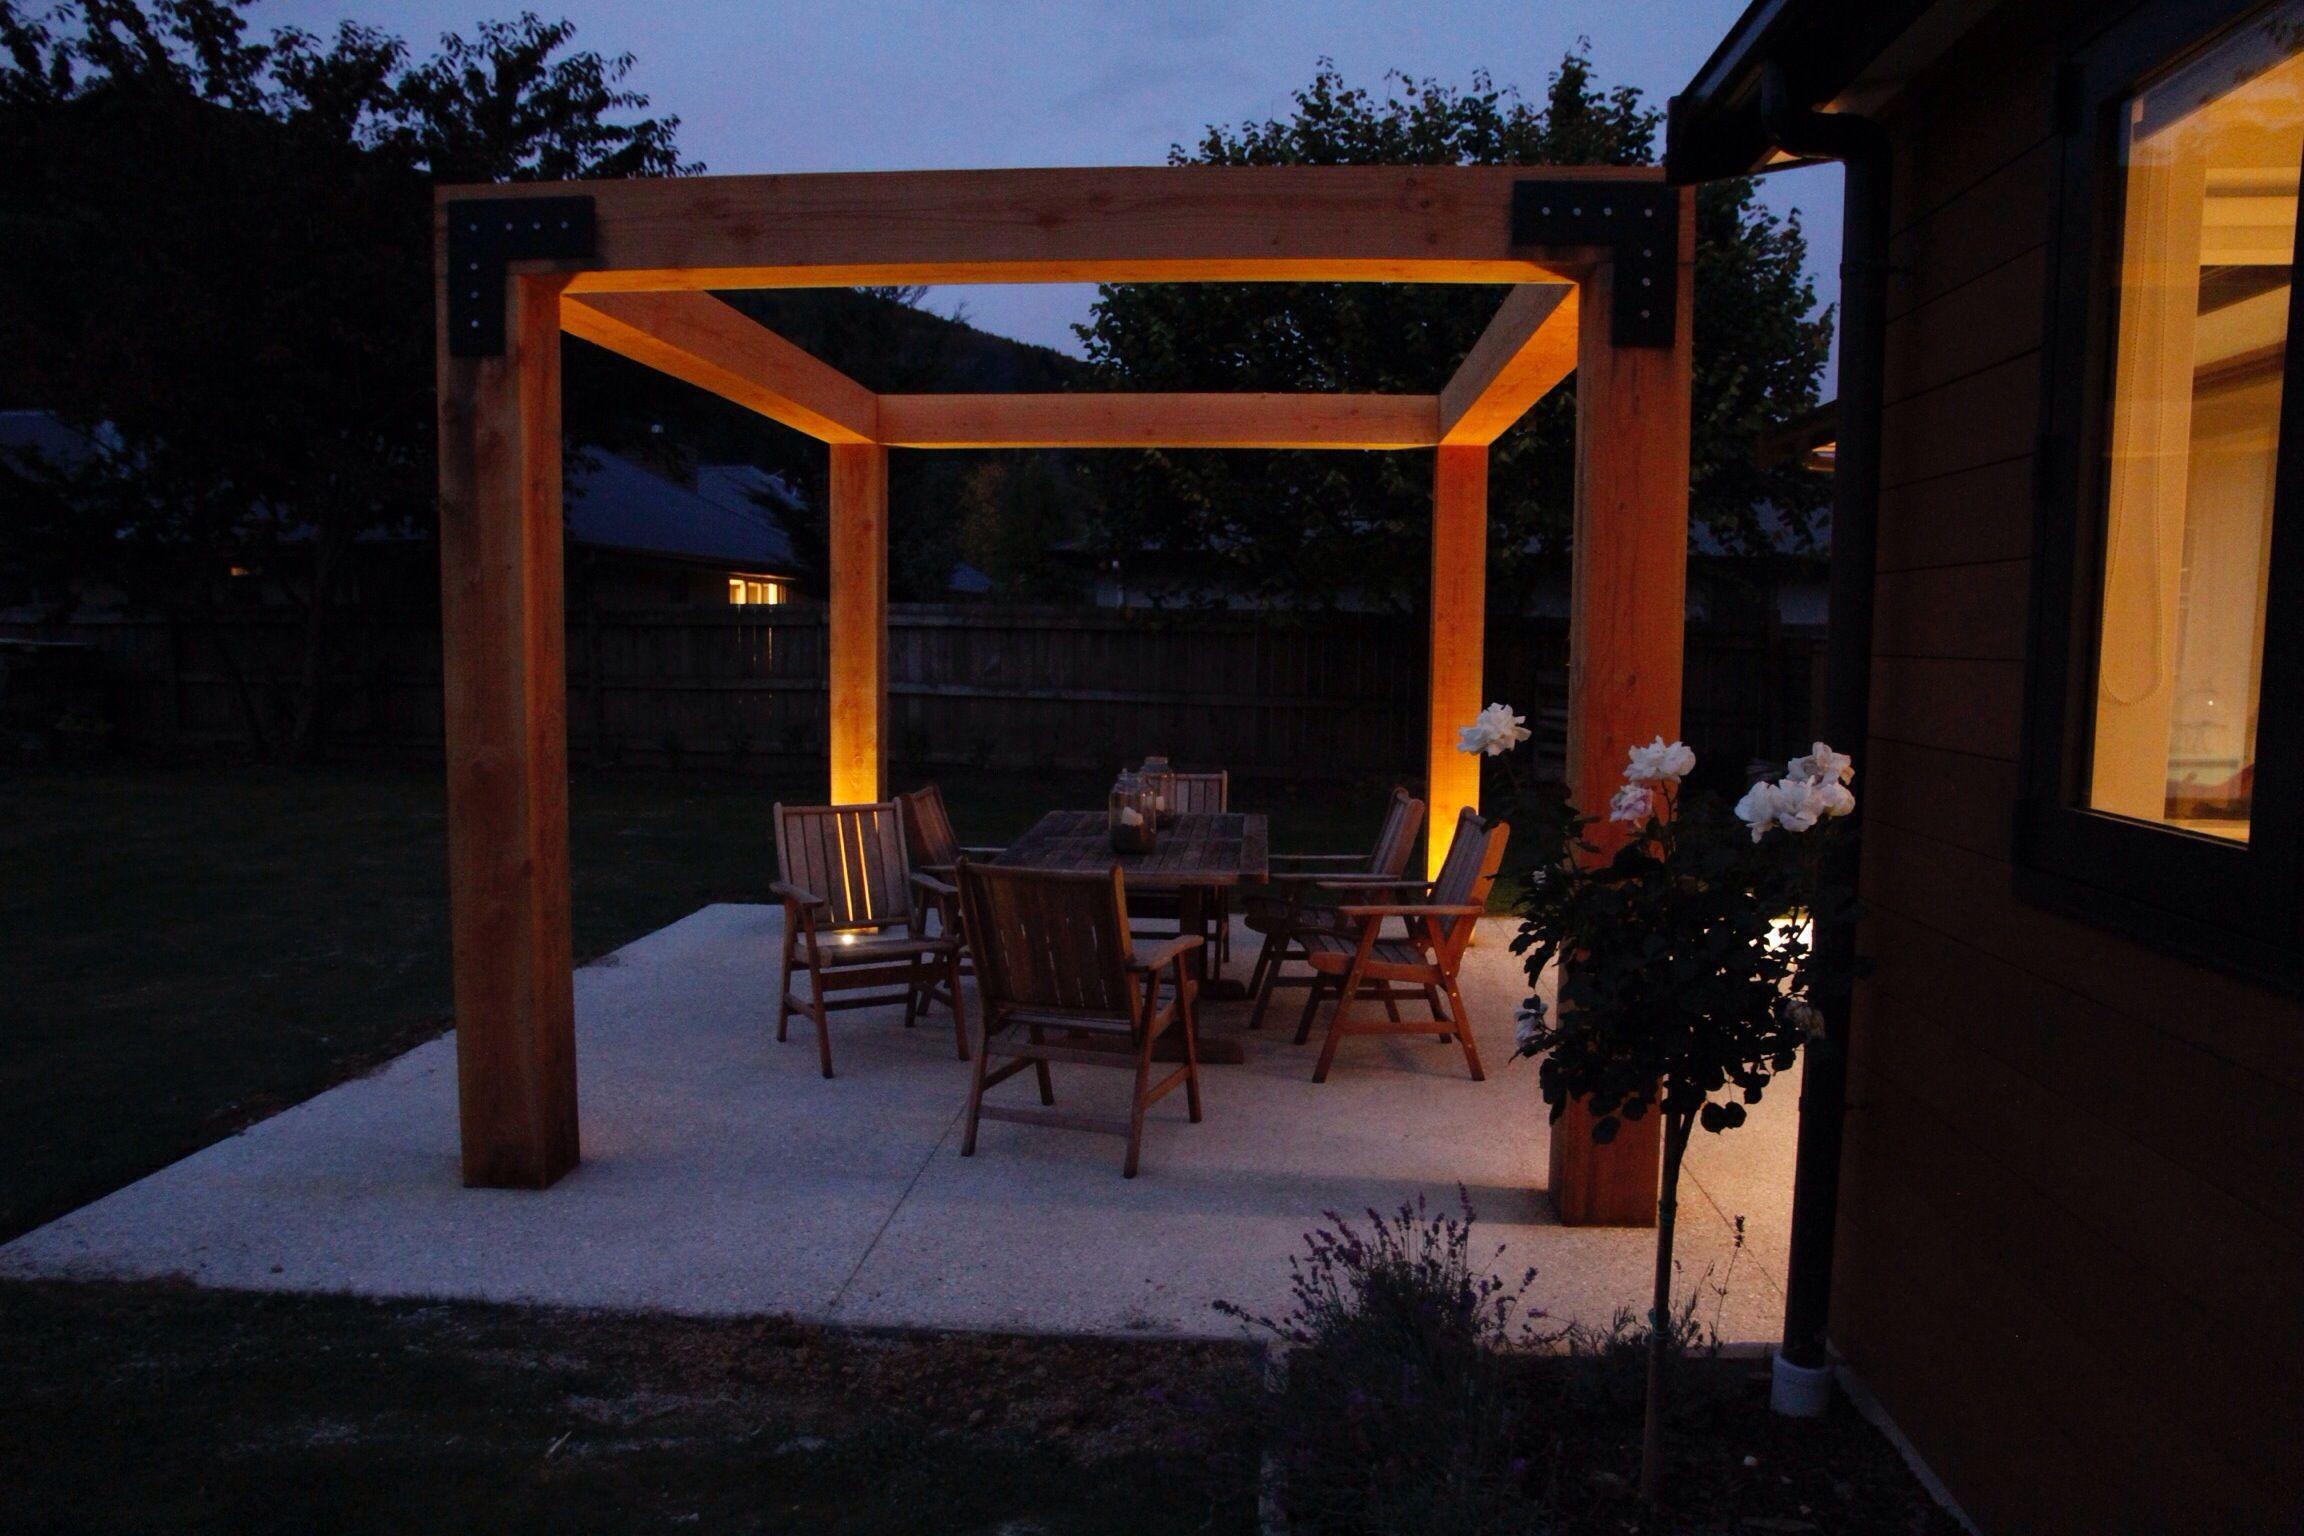 Pin pergola lighting on pinterest - Lights